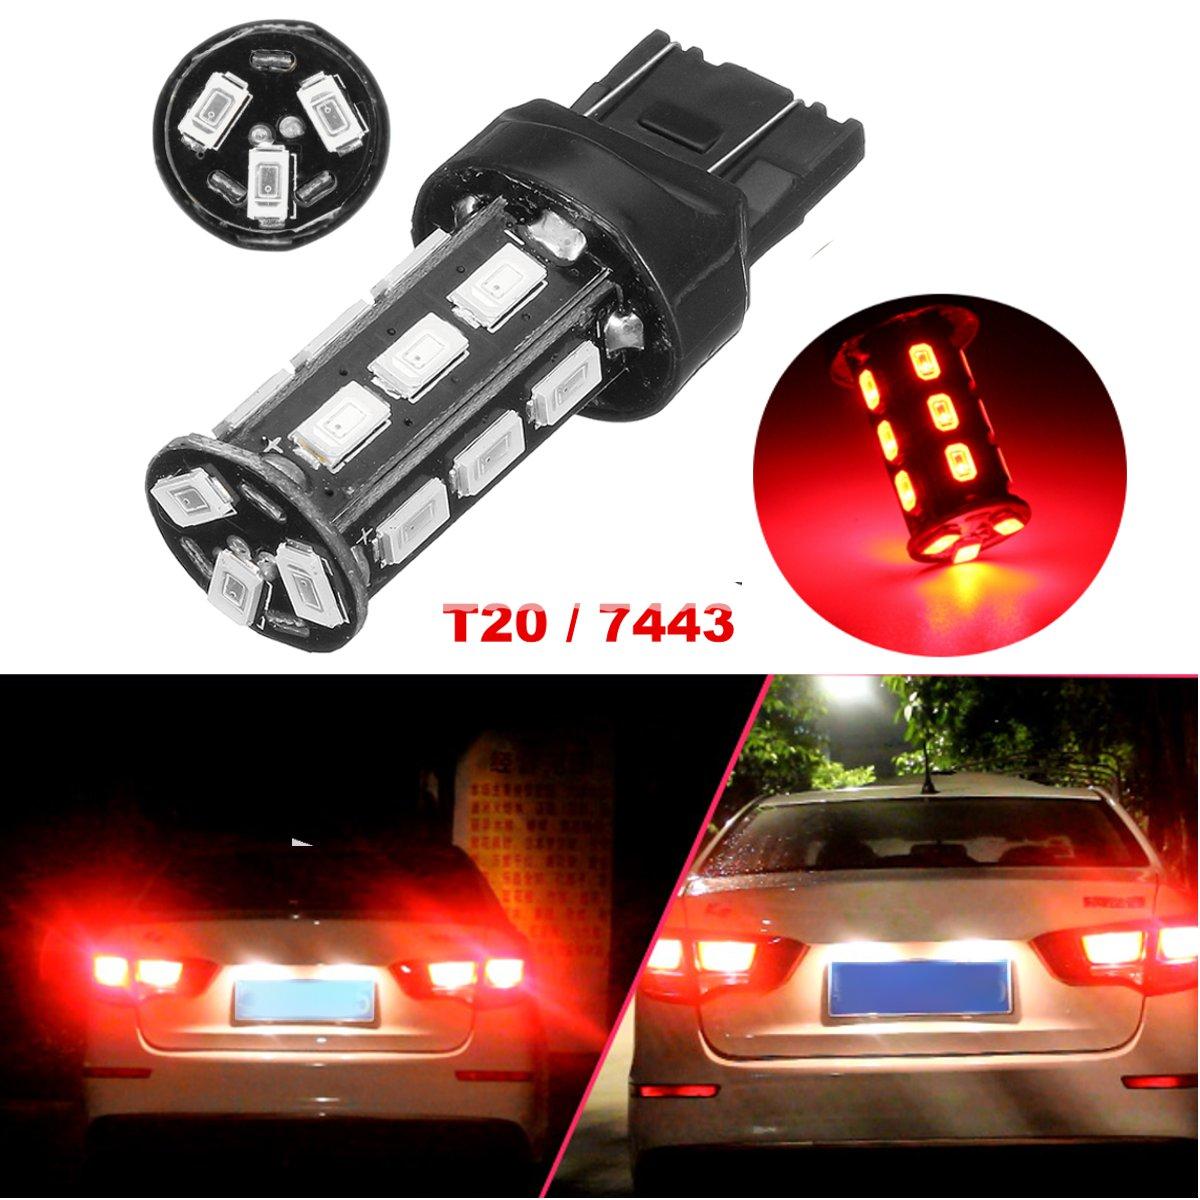 12V LED Dual Brake Stop Tail Light Bulb Red Lamp Extra Long Service Life Brake Light T20 7443 18 SMD 5630